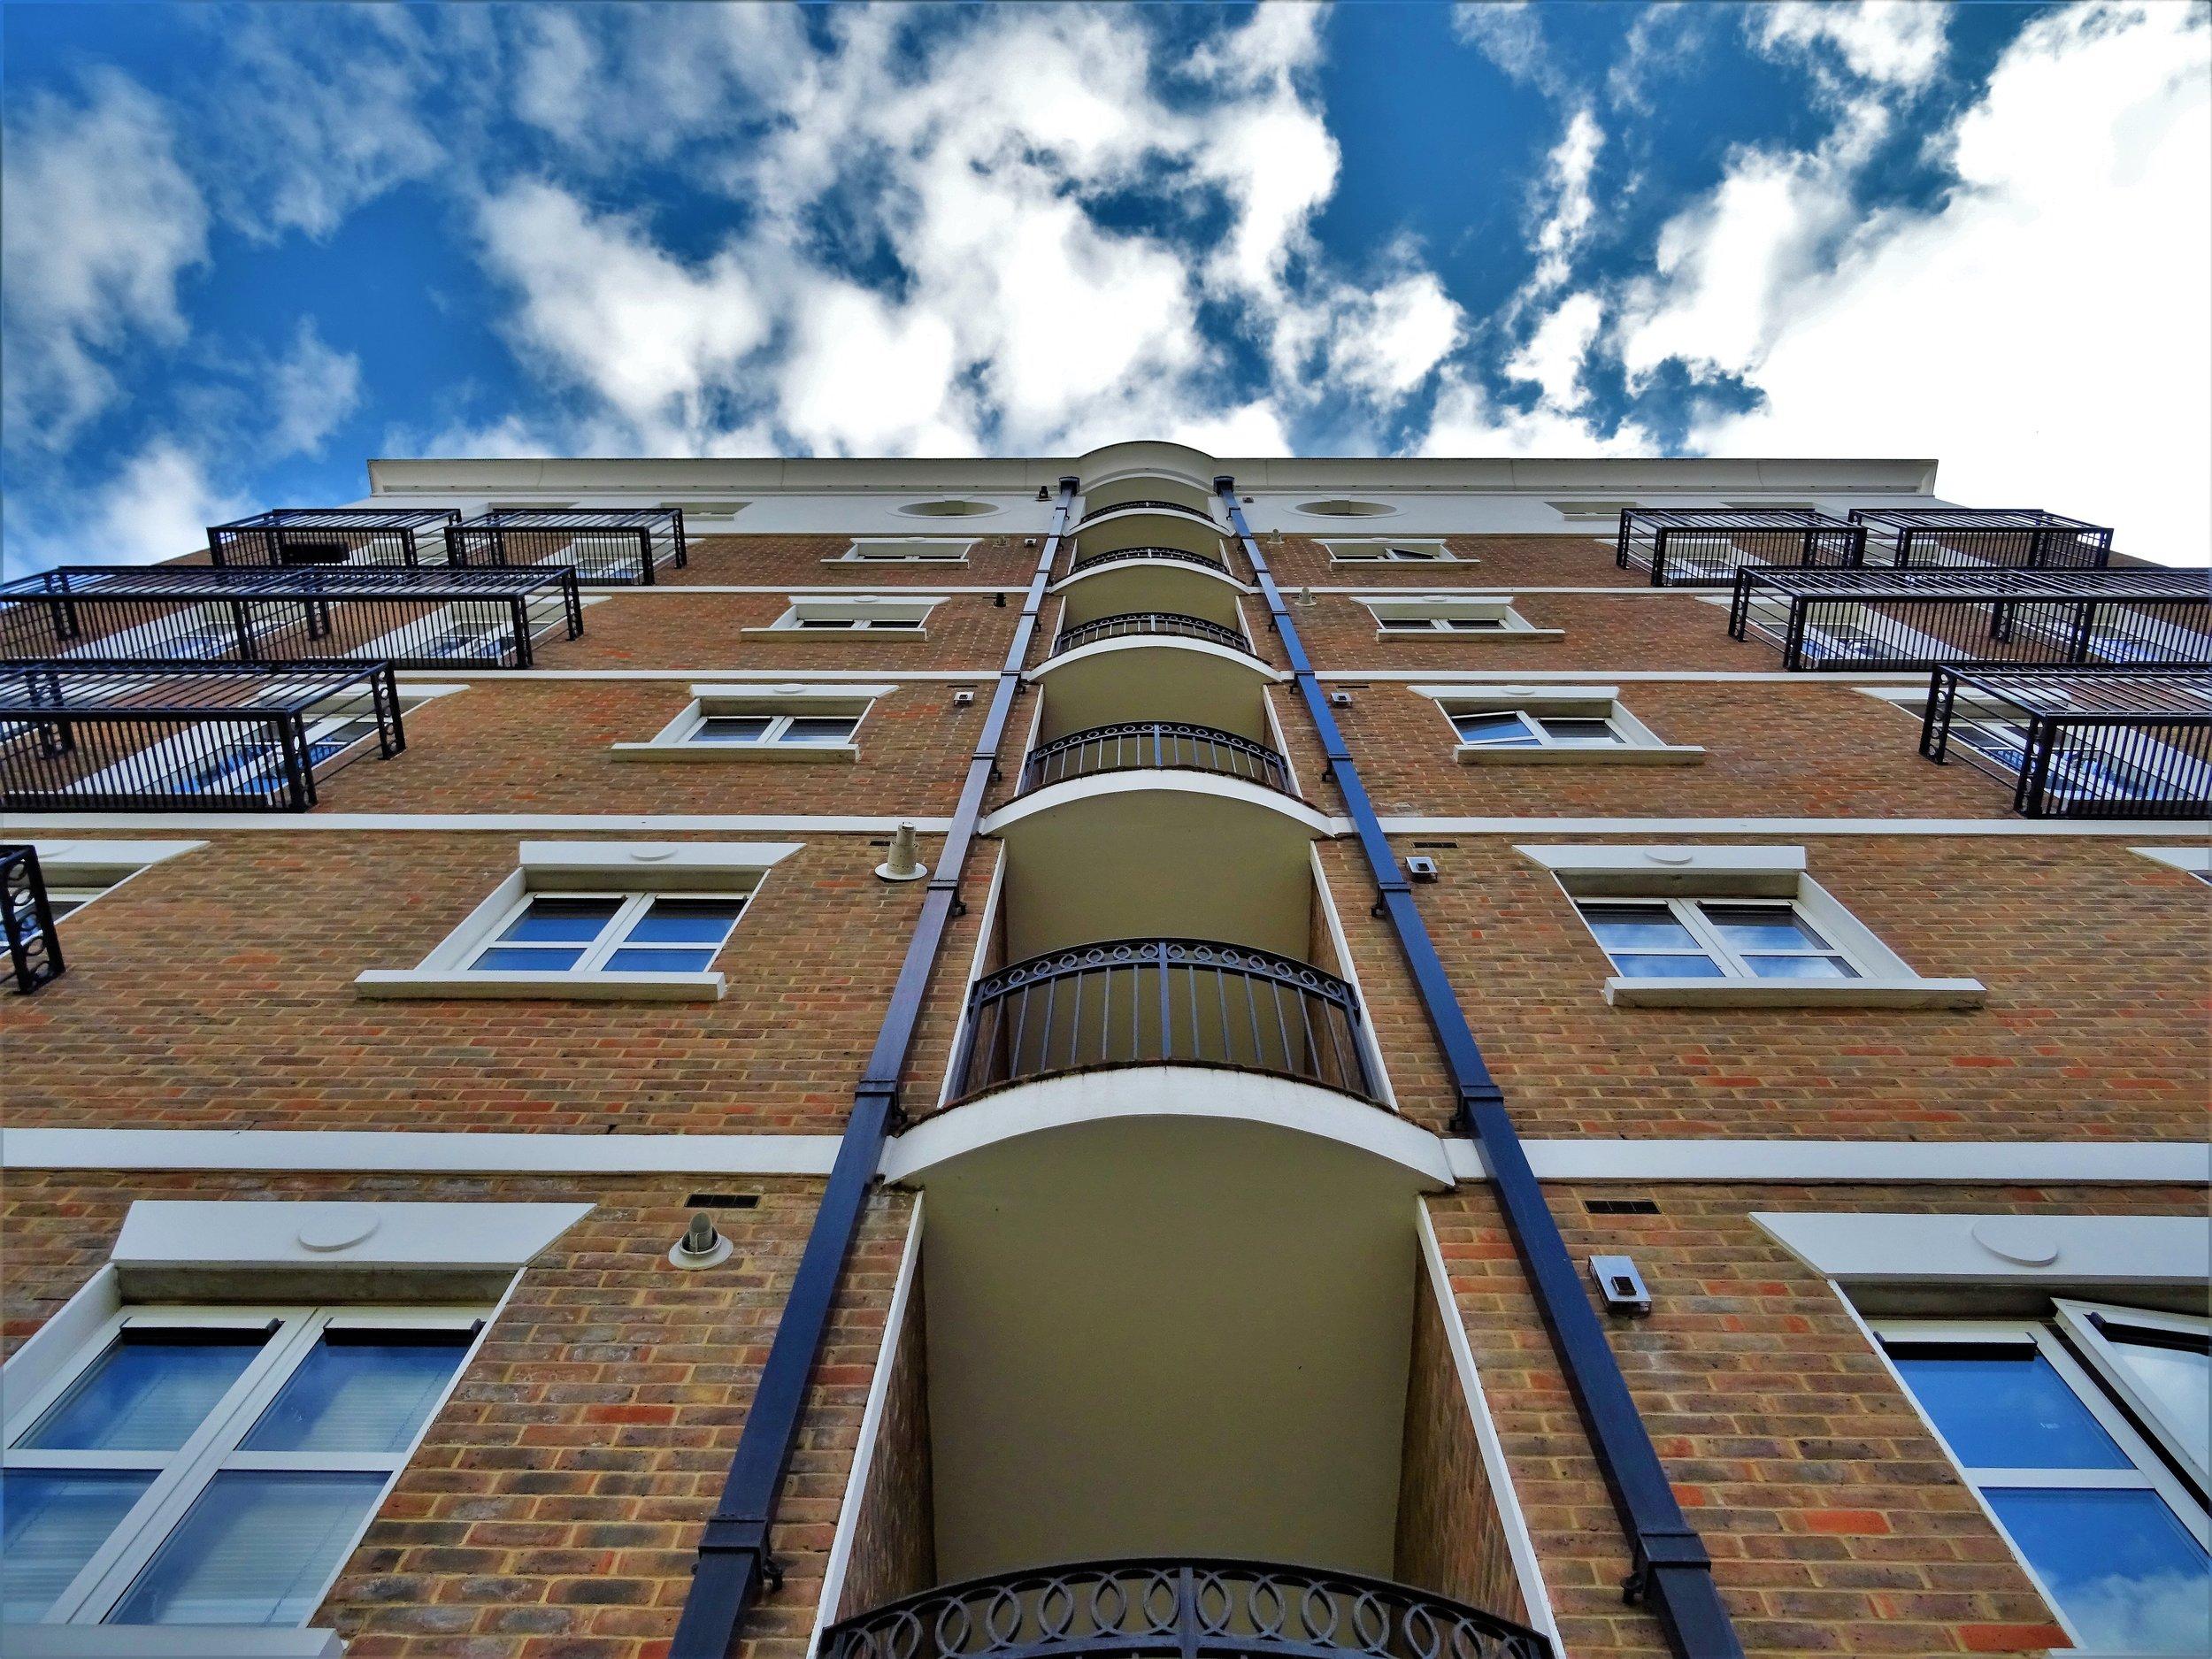 apartments-architectural-design-architecture-981916.jpg